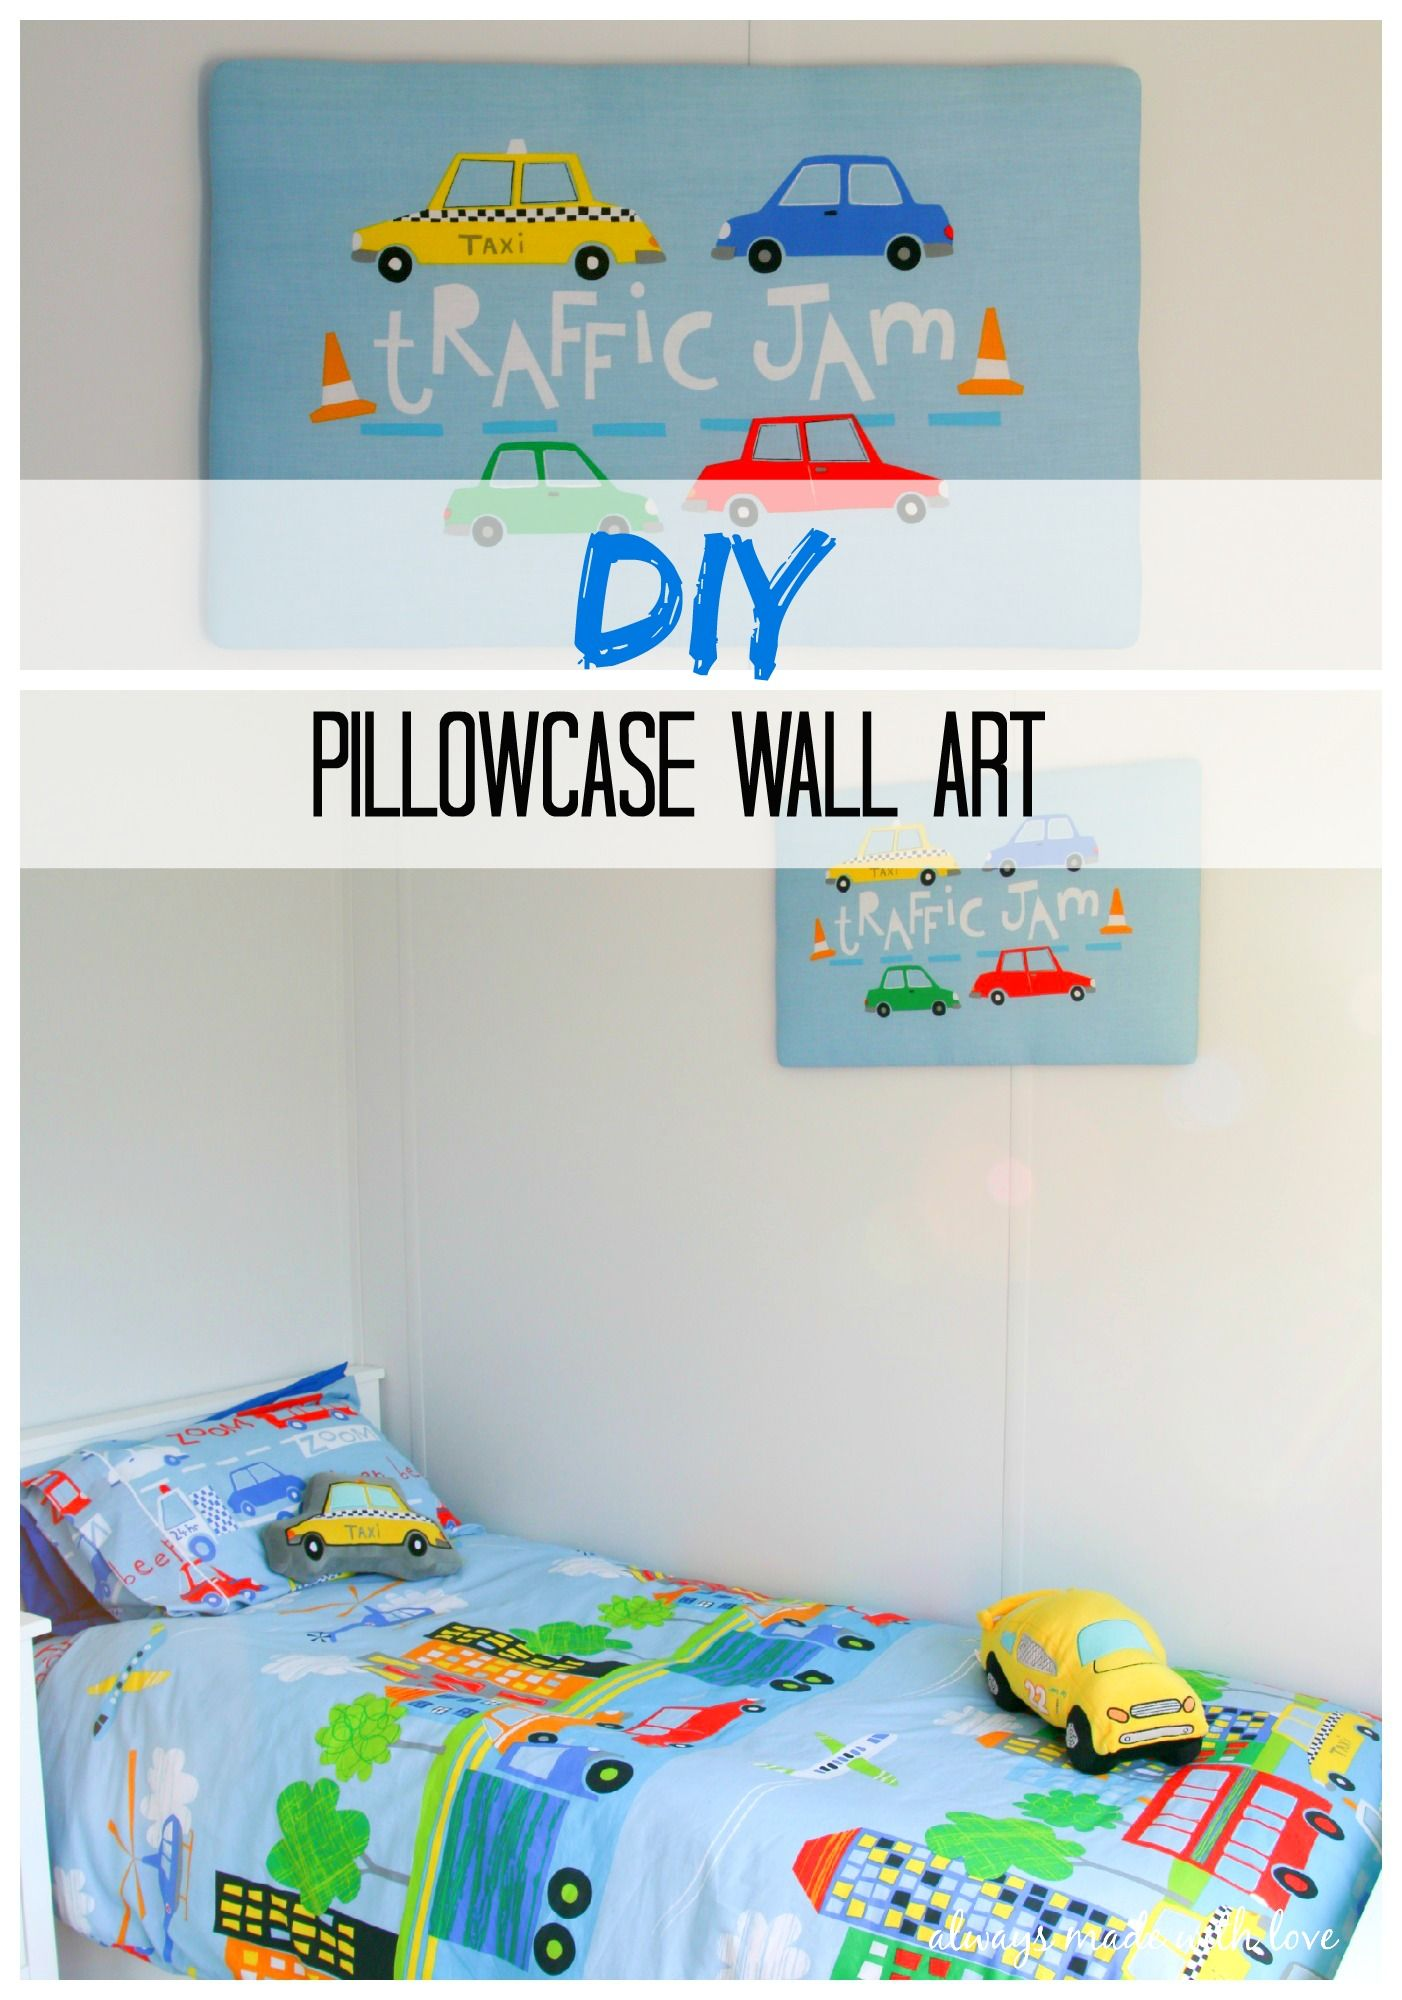 An easy DIY turning the humble pillowcase into a fabulous piece of custom Pillowcase Wall Art